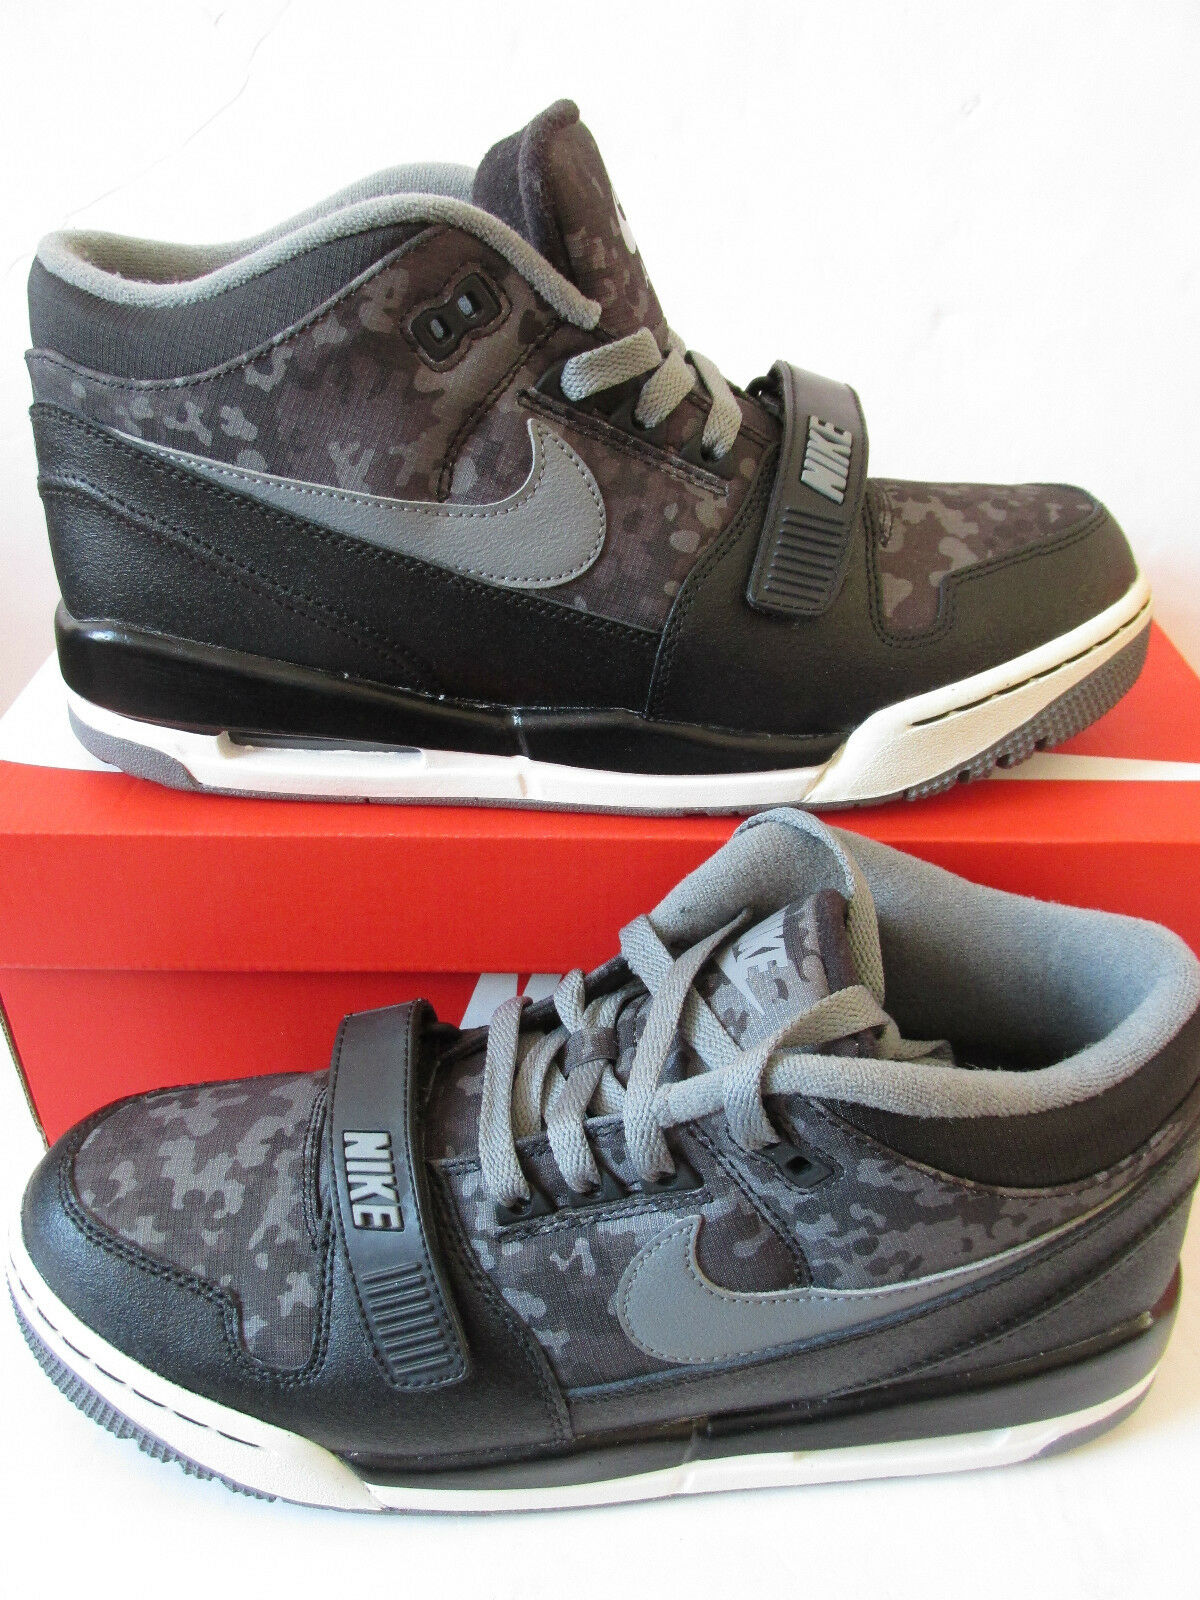 Nike air alphalution Prm Homme Baskets Montantes chaussures Baskets 708478 001